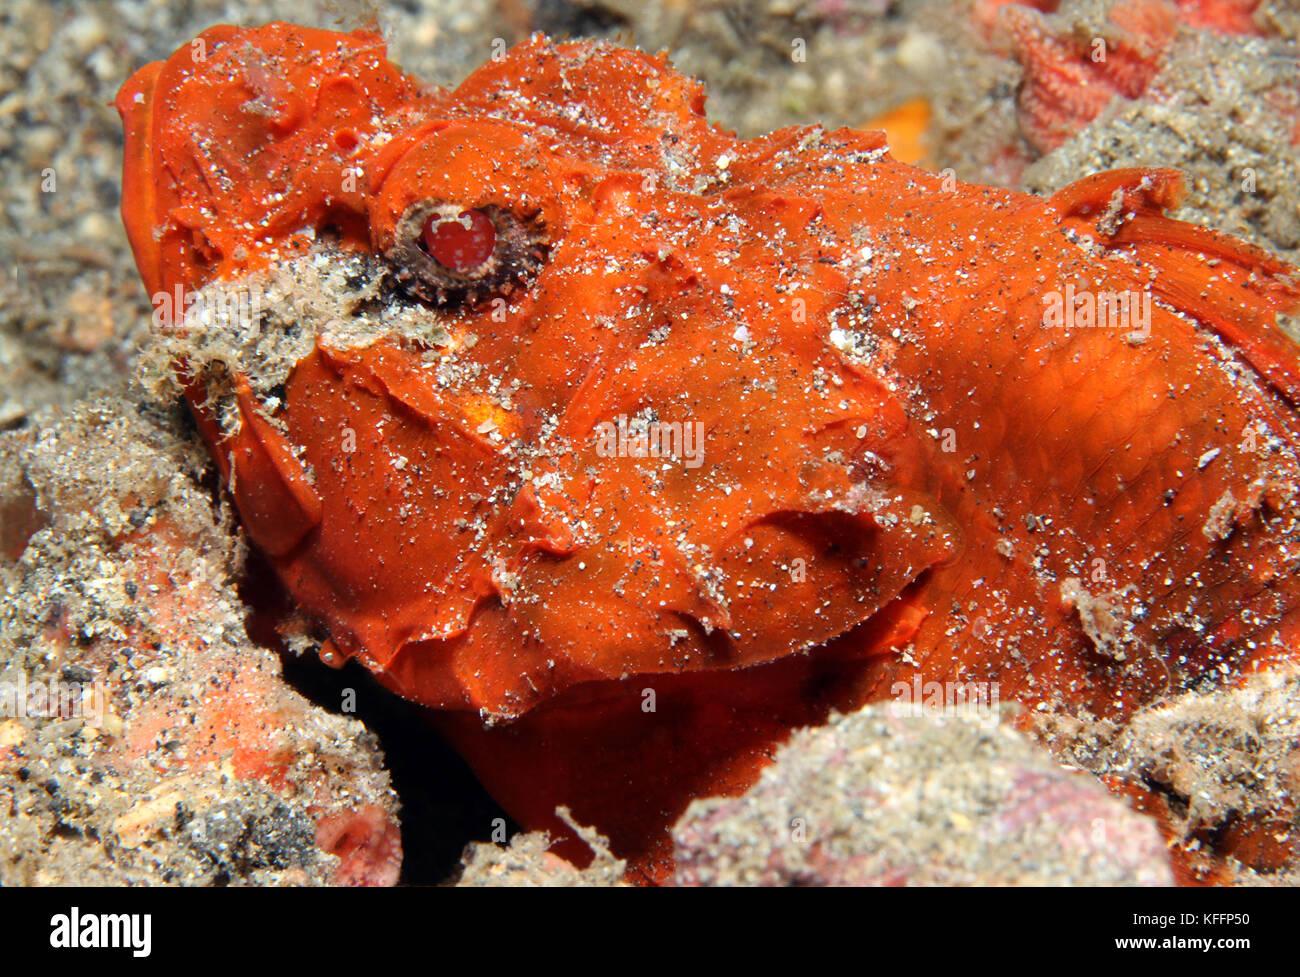 Humpback Scorpionfish (Scorpaenopsis macrochir, aka Flasher Scorpionfish, Rough Humpback Scorpionfish). Lembeh Strait, - Stock Image